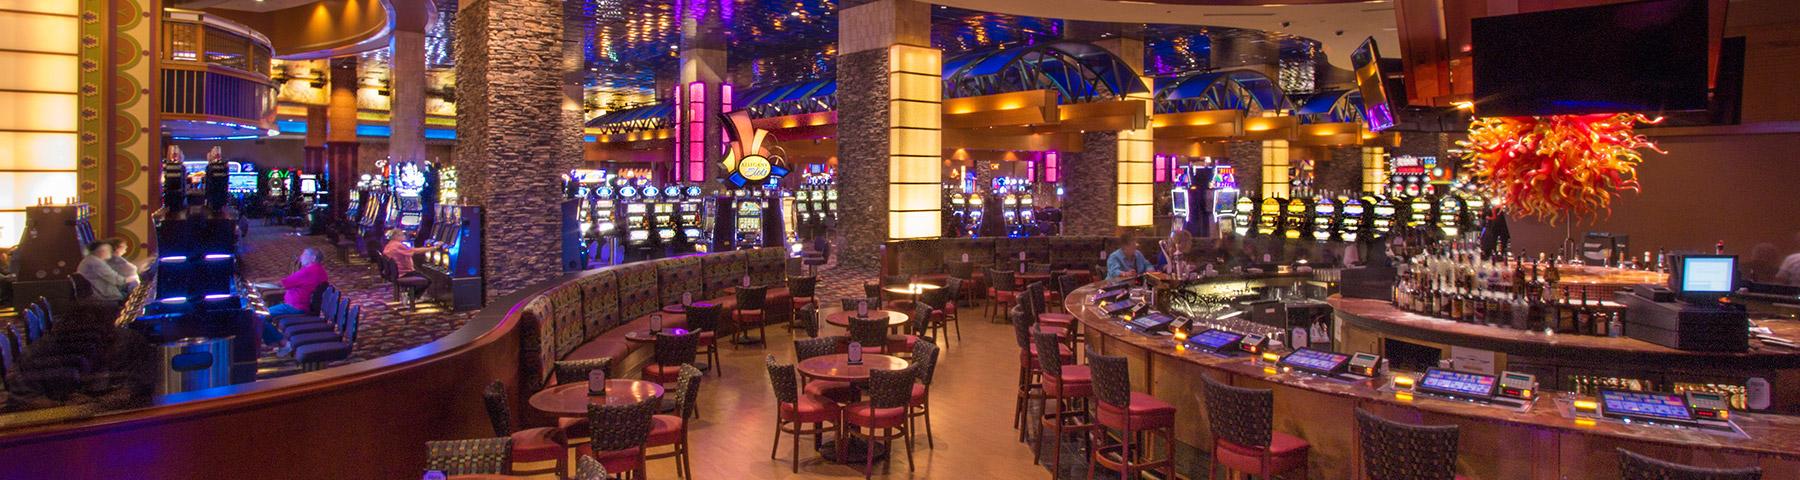 Allengany senica casino slot machine bonuses